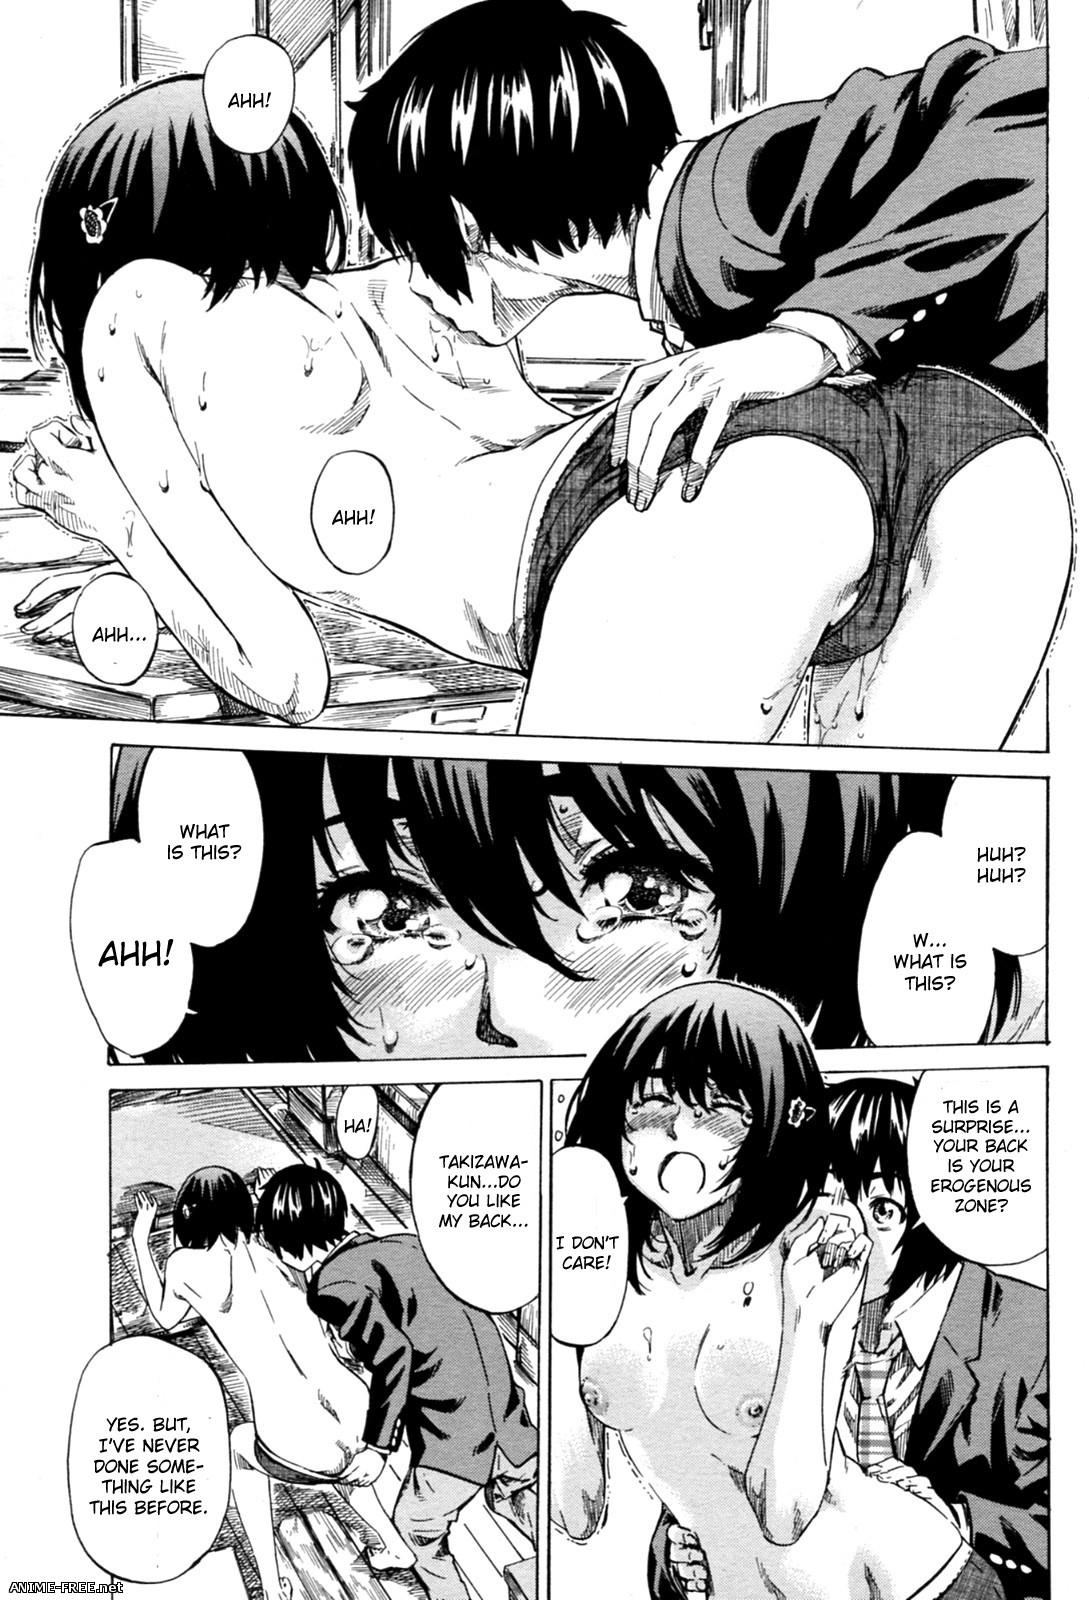 MARUTA / MARUTA DO-JO - Сборник работ [Ptcen] [RUS,ENG,JAP] Manga Hentai